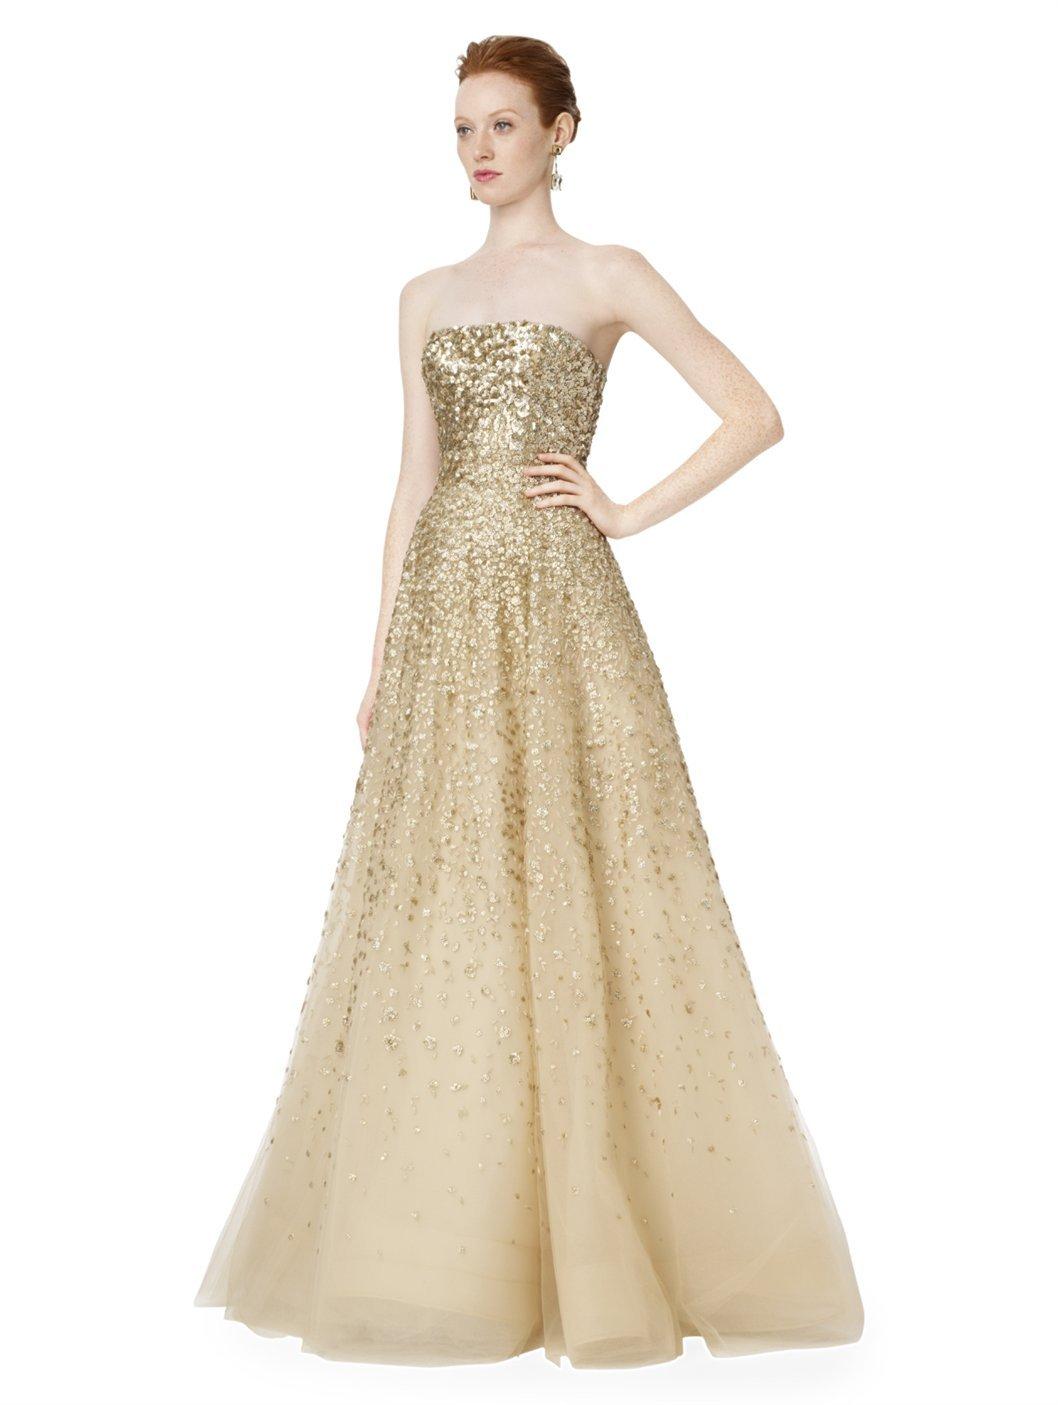 Oscar De La Renta Strapless Embroidered Gown in Metallic - Lyst